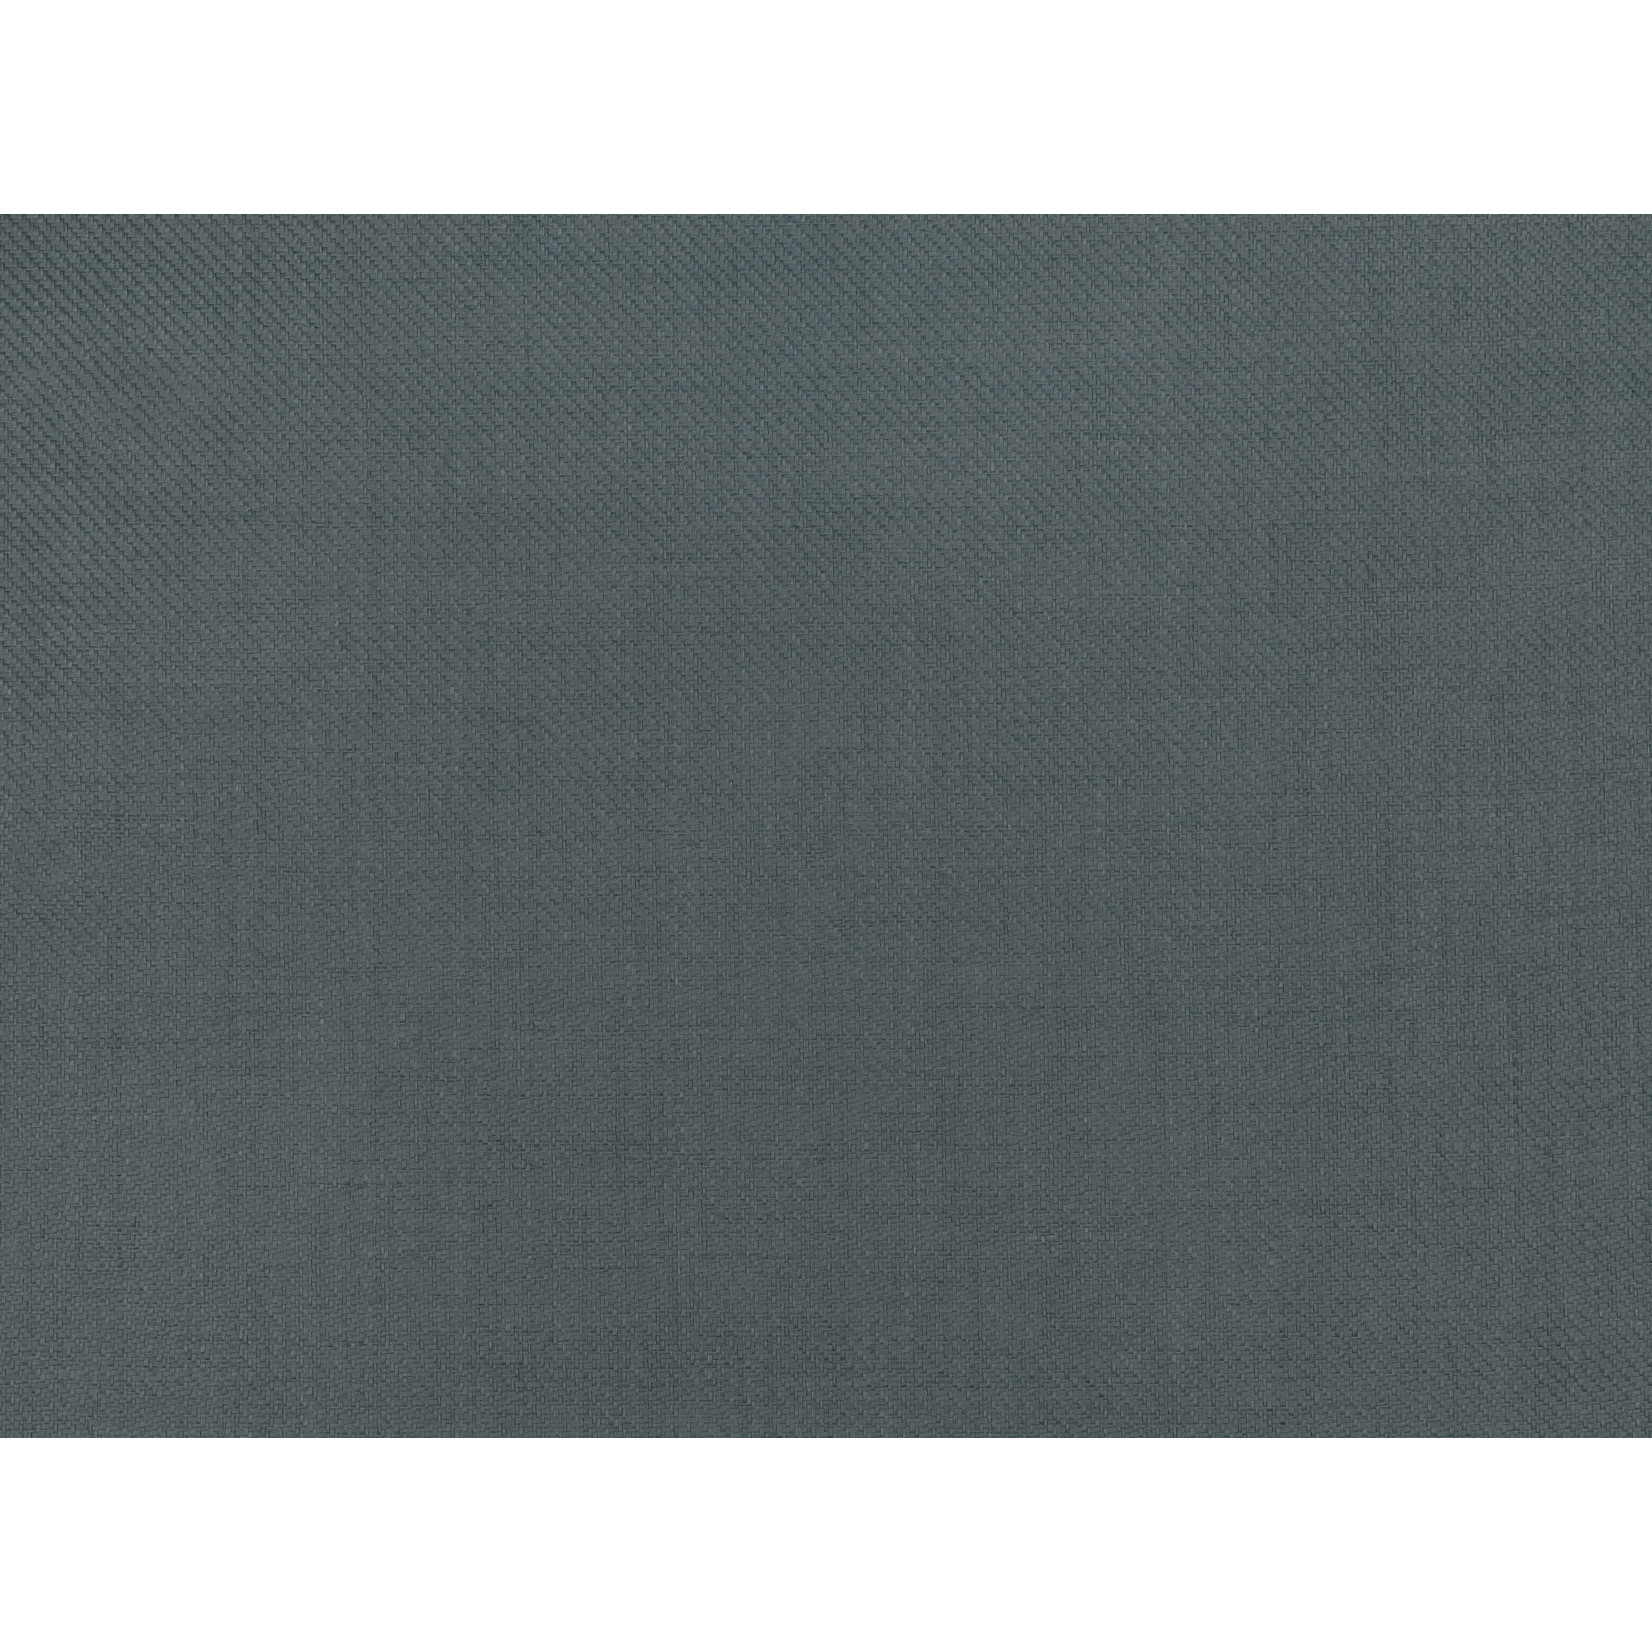 Mark Alexander Paperweave Handwoven Wallcoverings | Paper Caspian